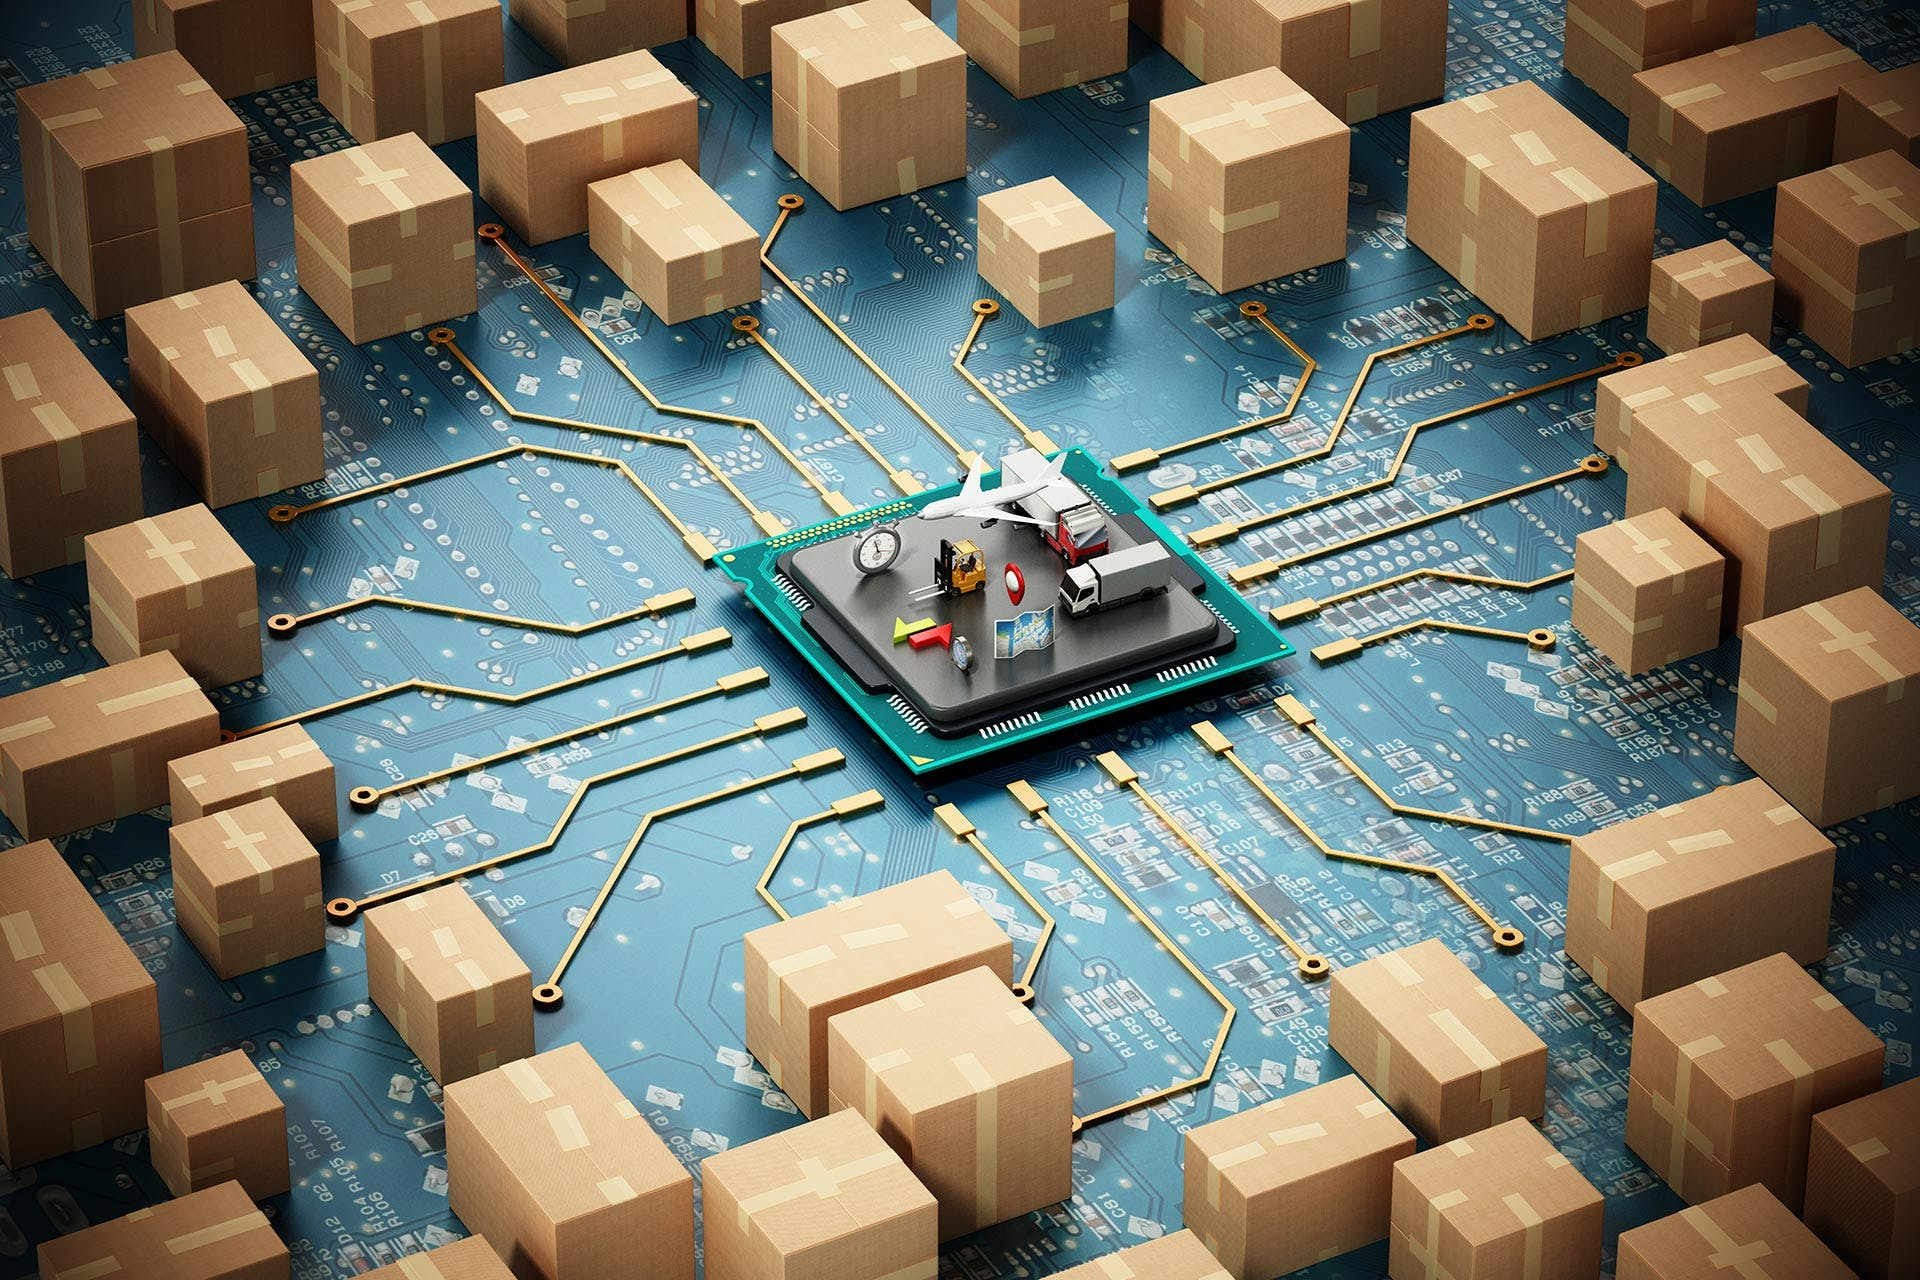 VITRONIC Visionary Smart Logistics